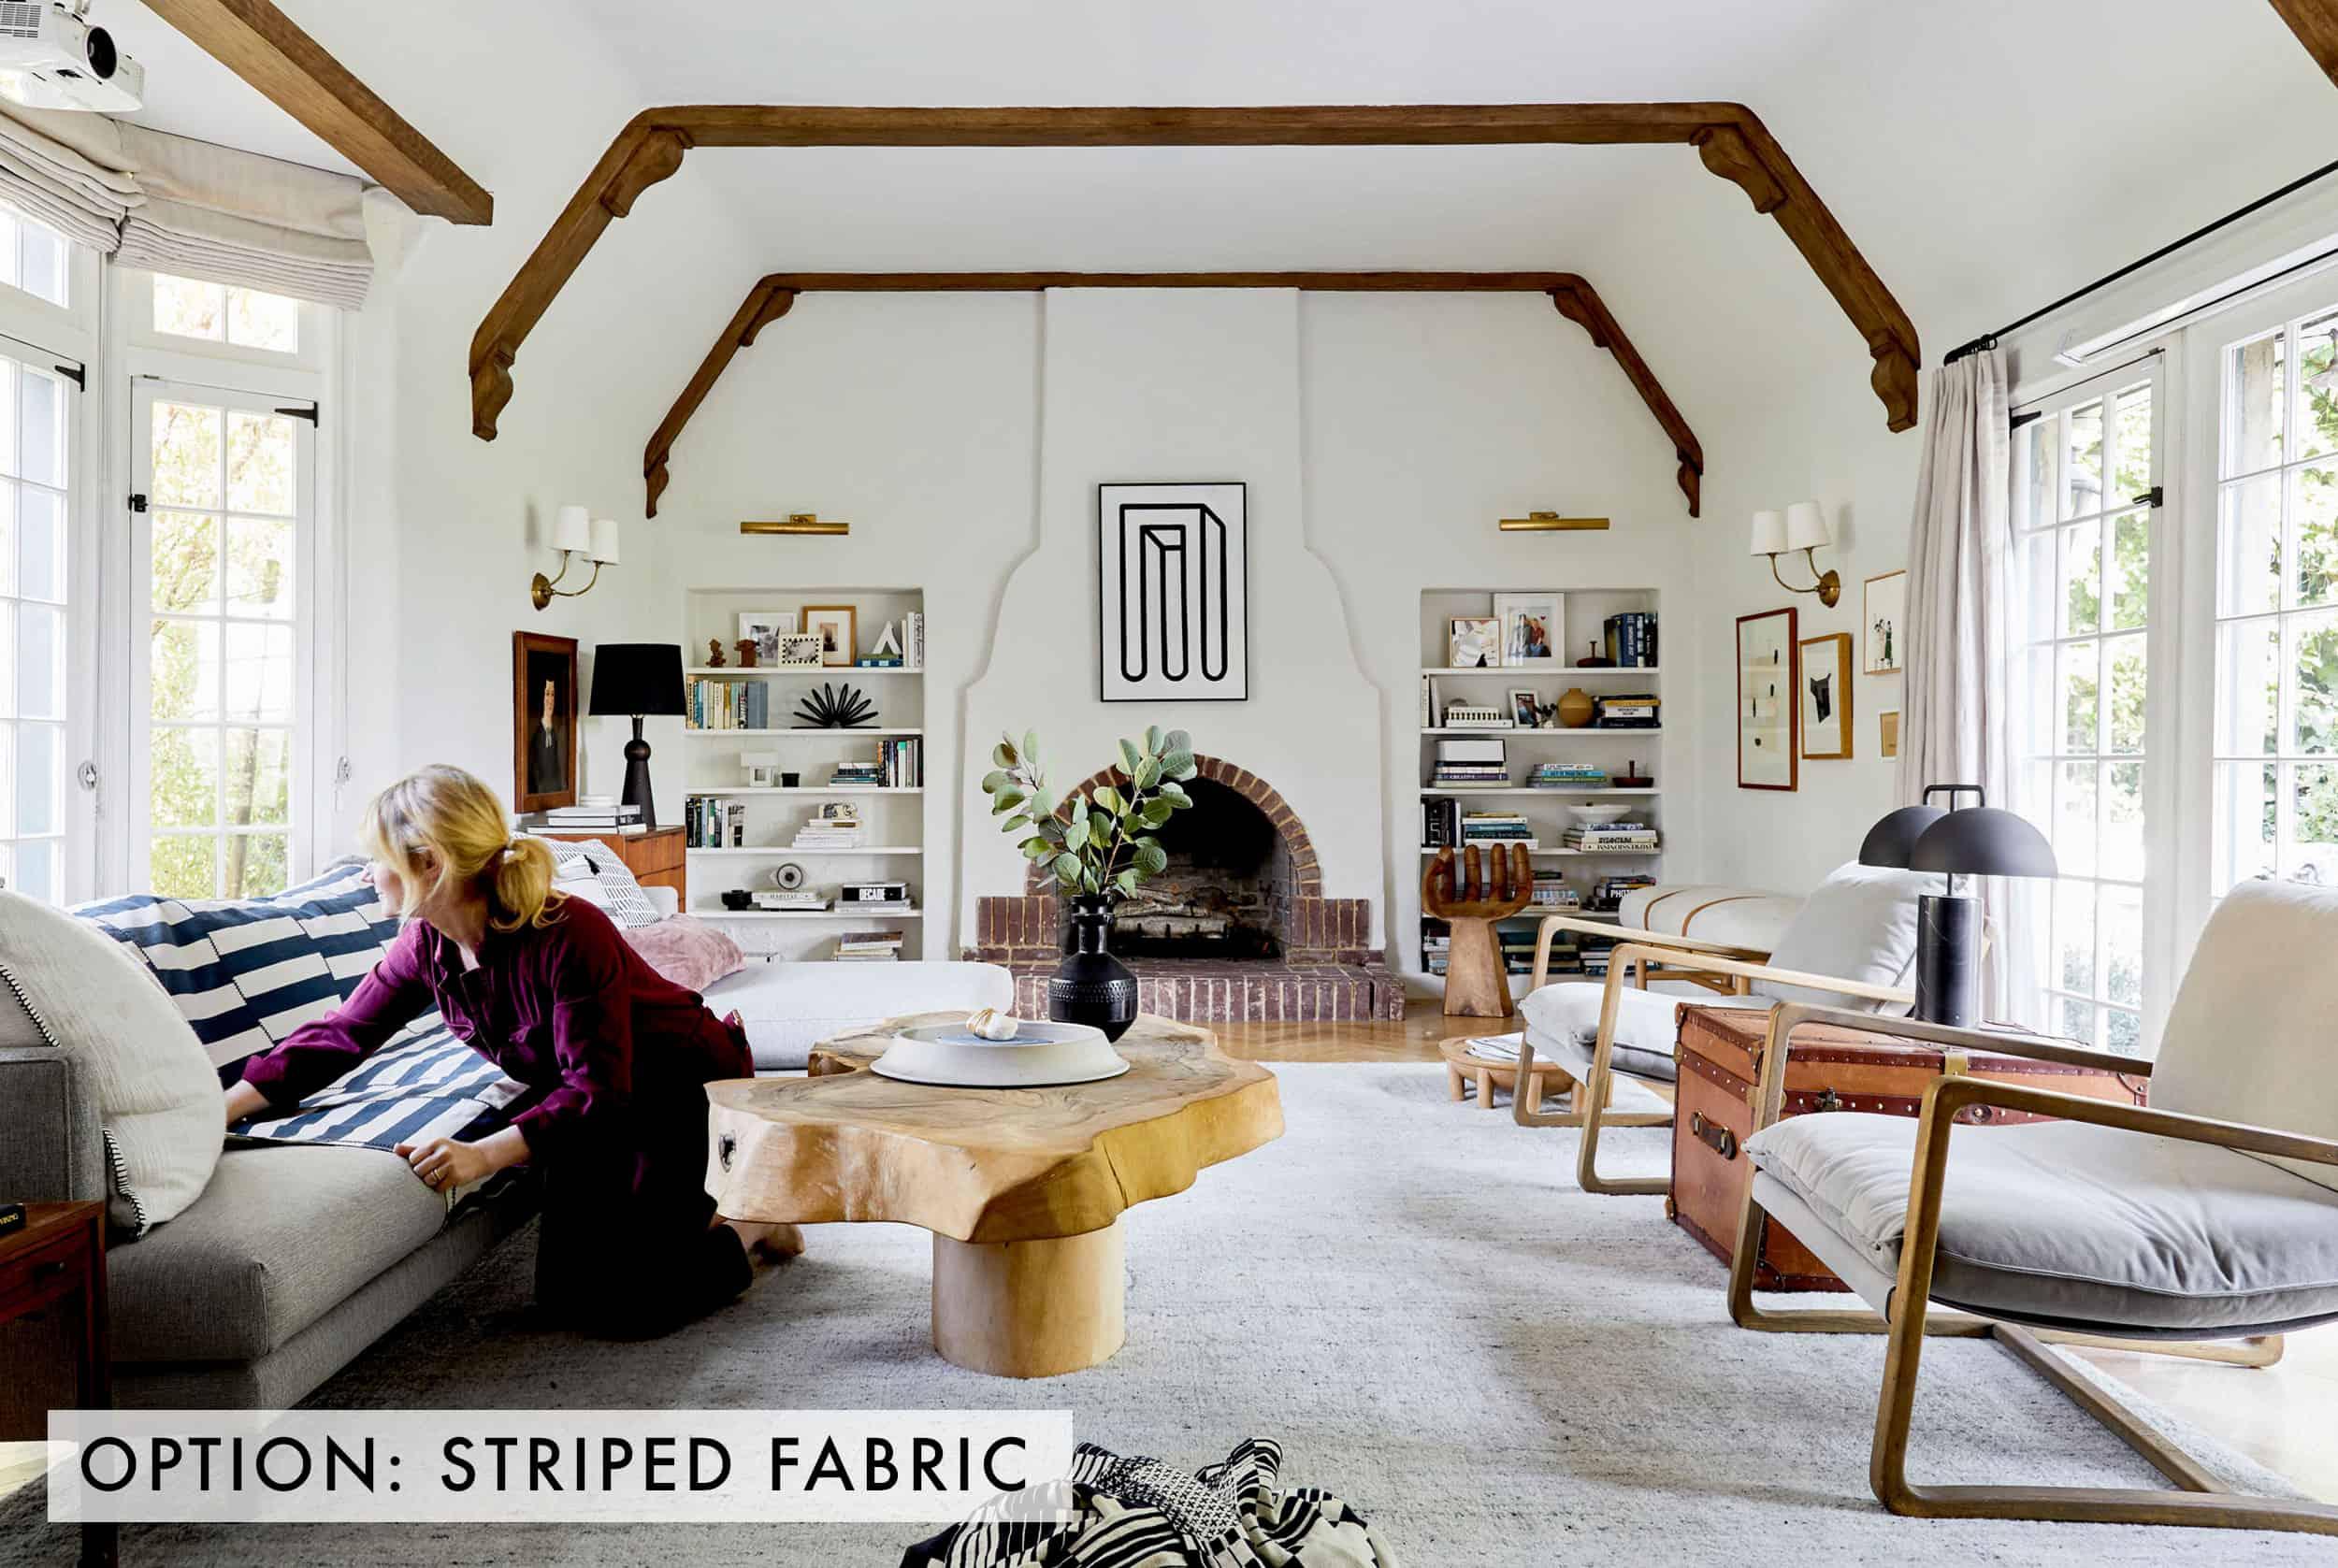 Striped Fabric On Sofa